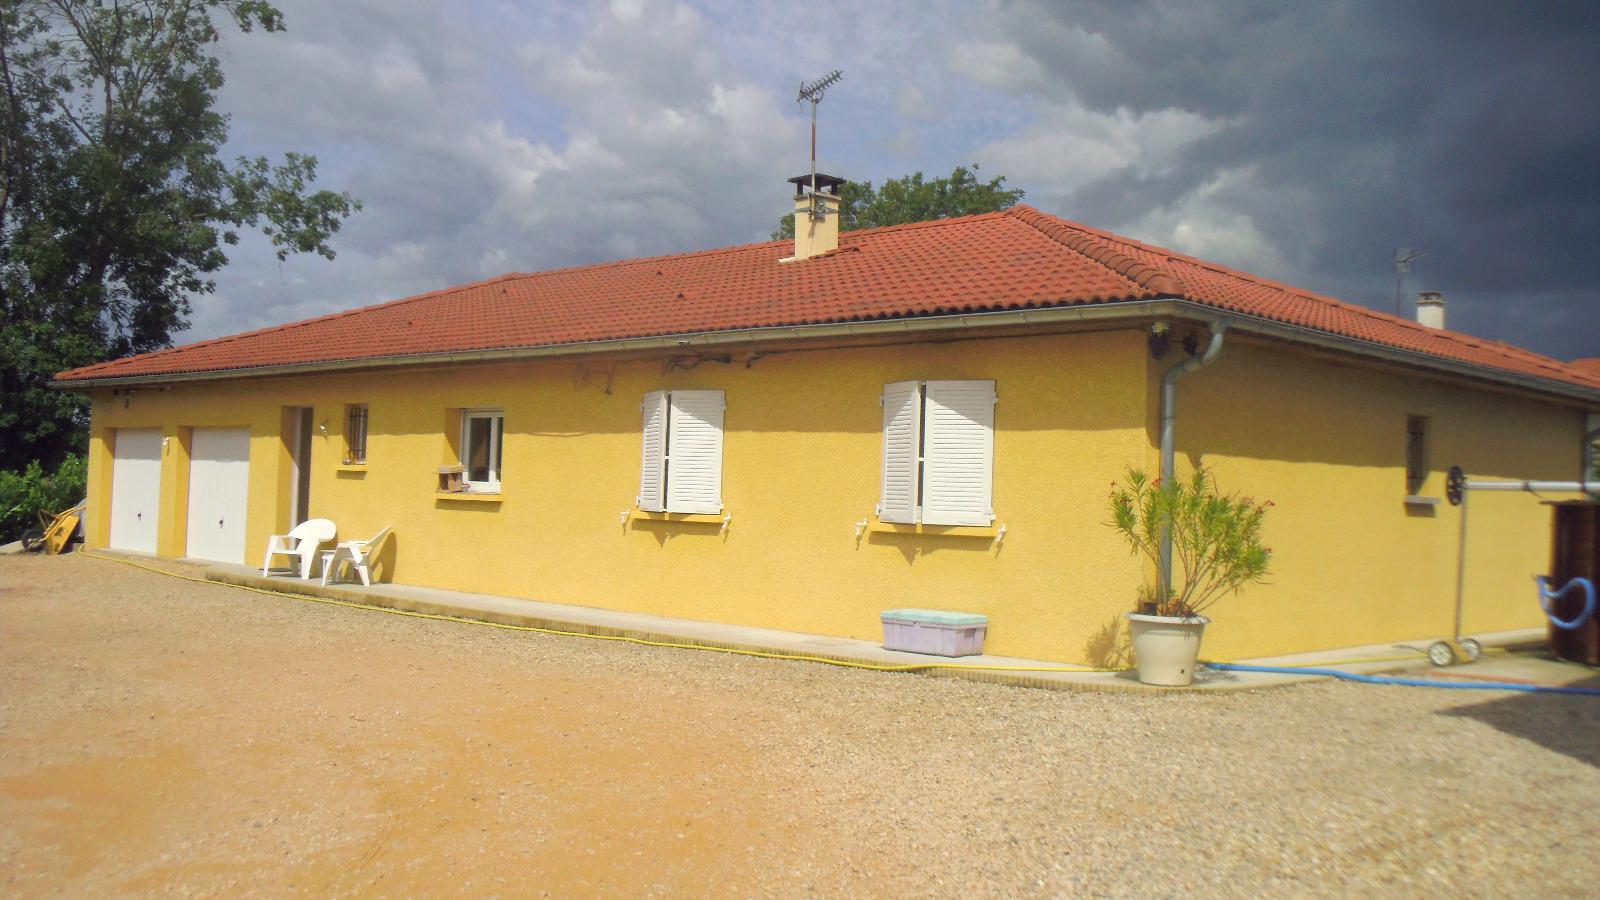 canton de montrevel en bresse a vendre villa r cente 5 chambres immobresse. Black Bedroom Furniture Sets. Home Design Ideas